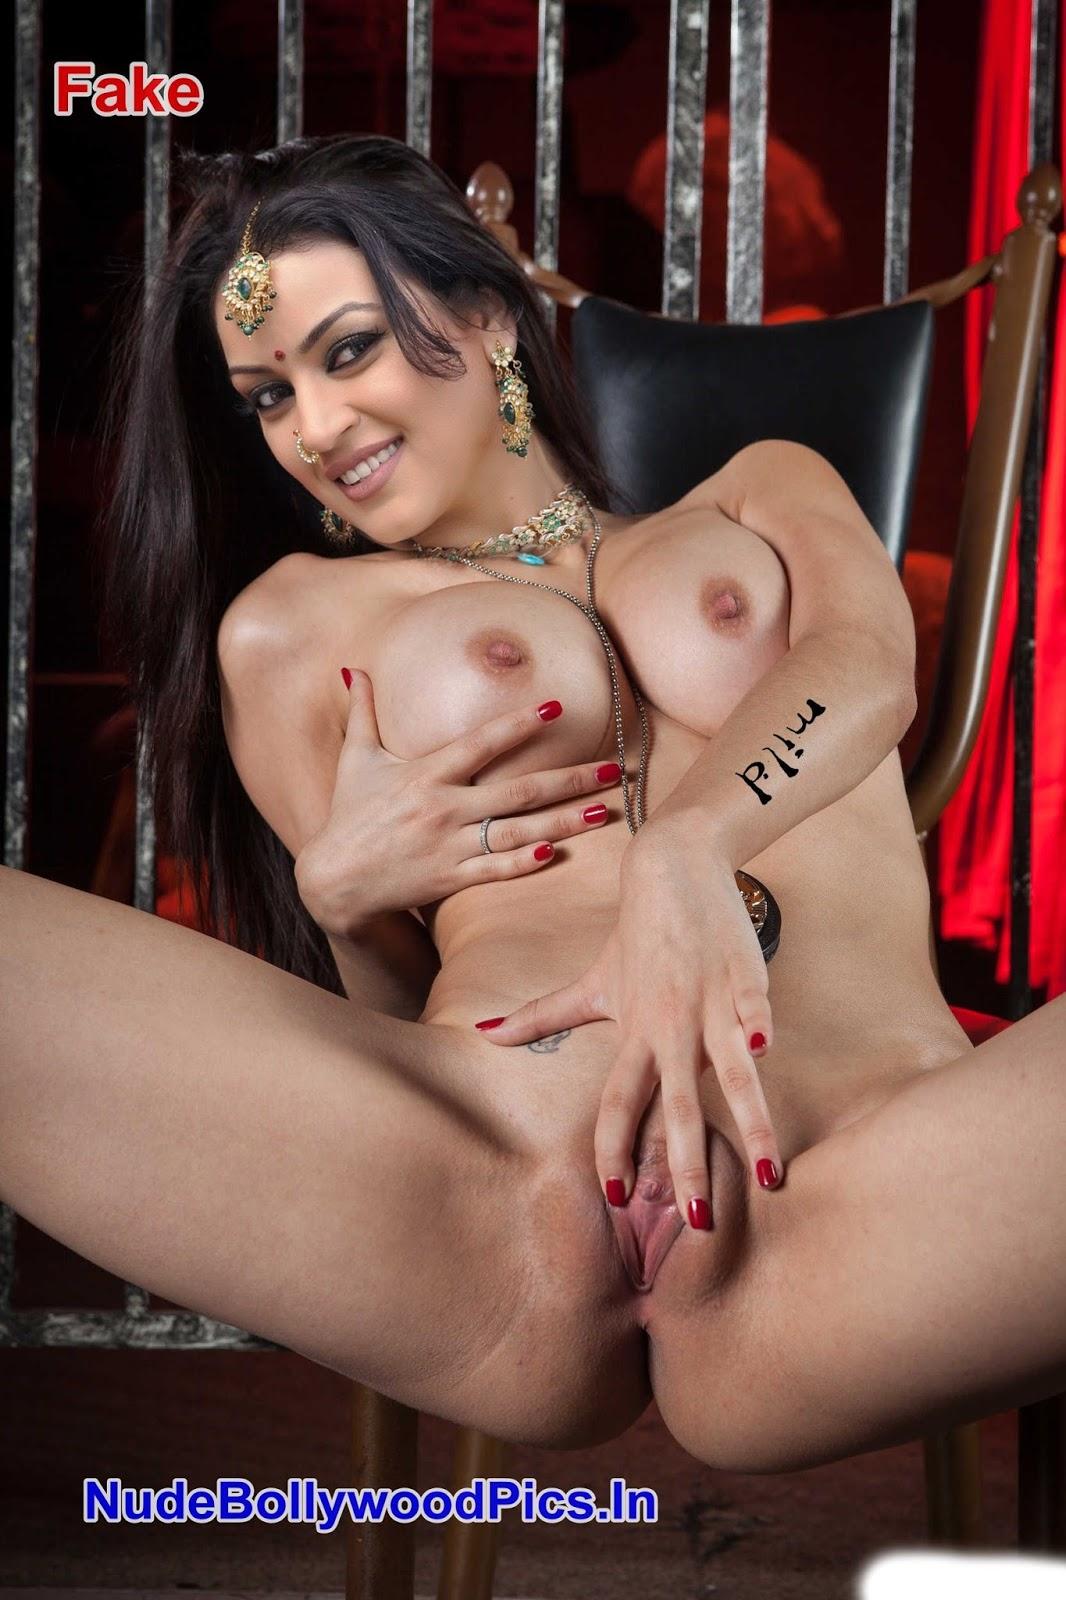 maryam zakaria maryam zakaria nude sqeezing her boobs amp fingering her